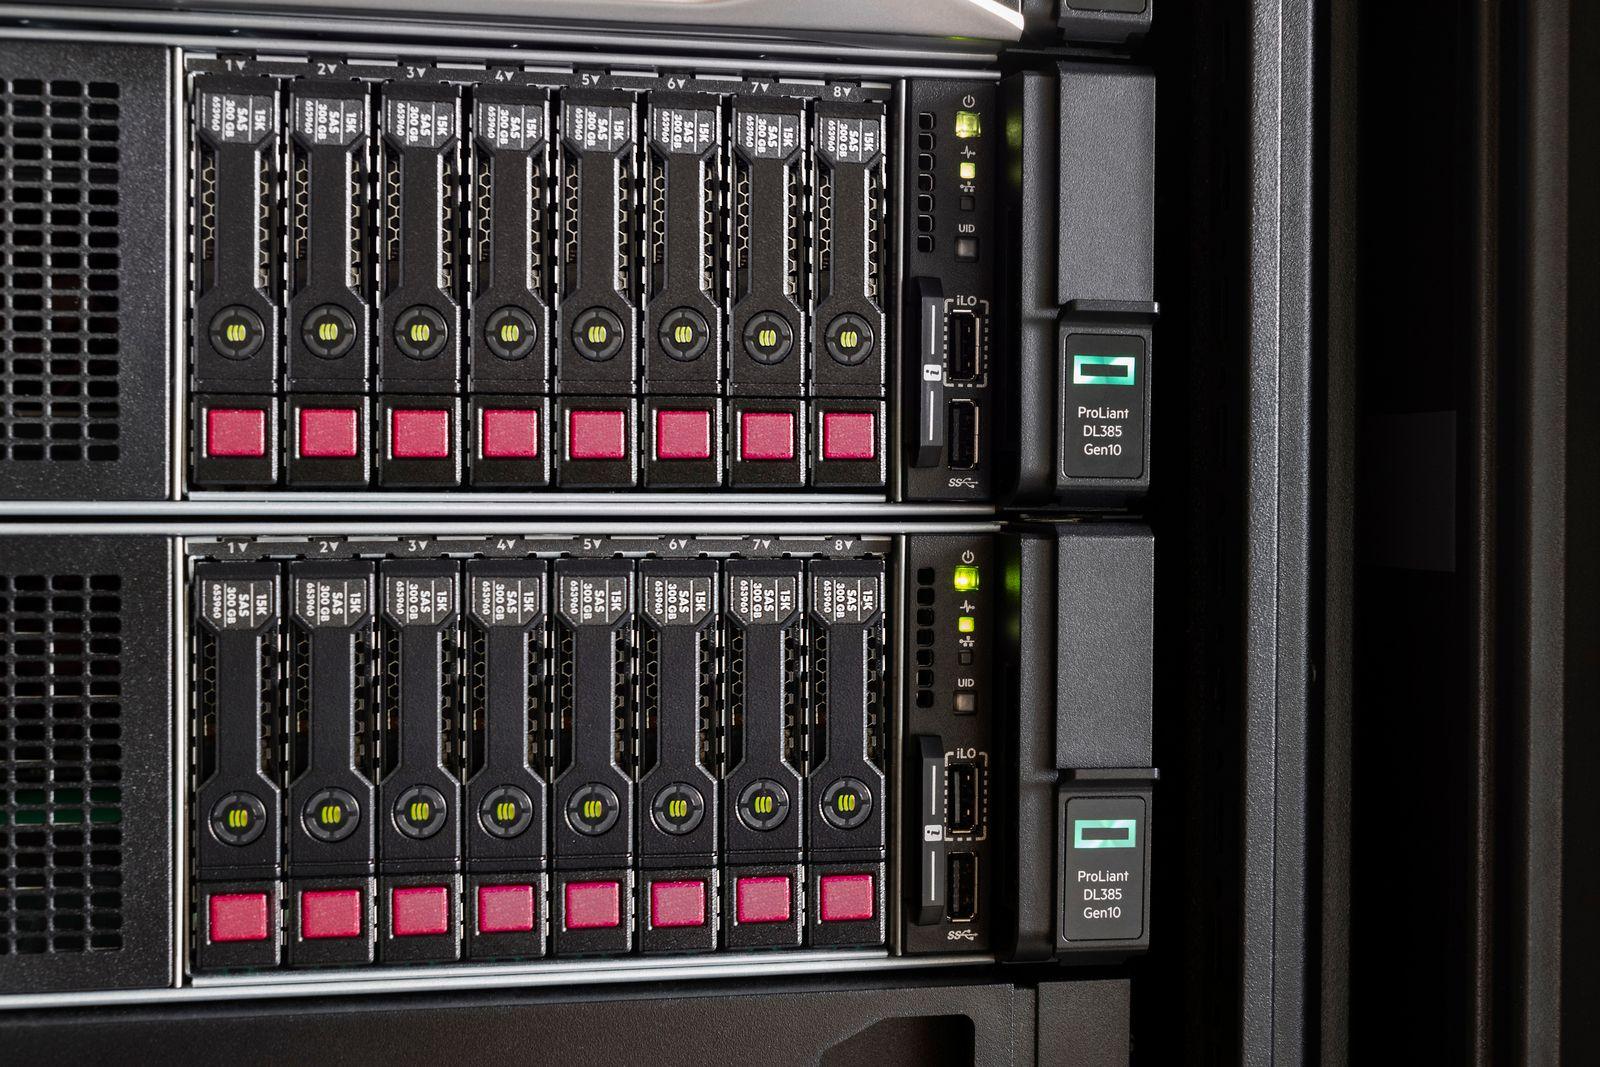 DL385 Gen10 Server.jpg